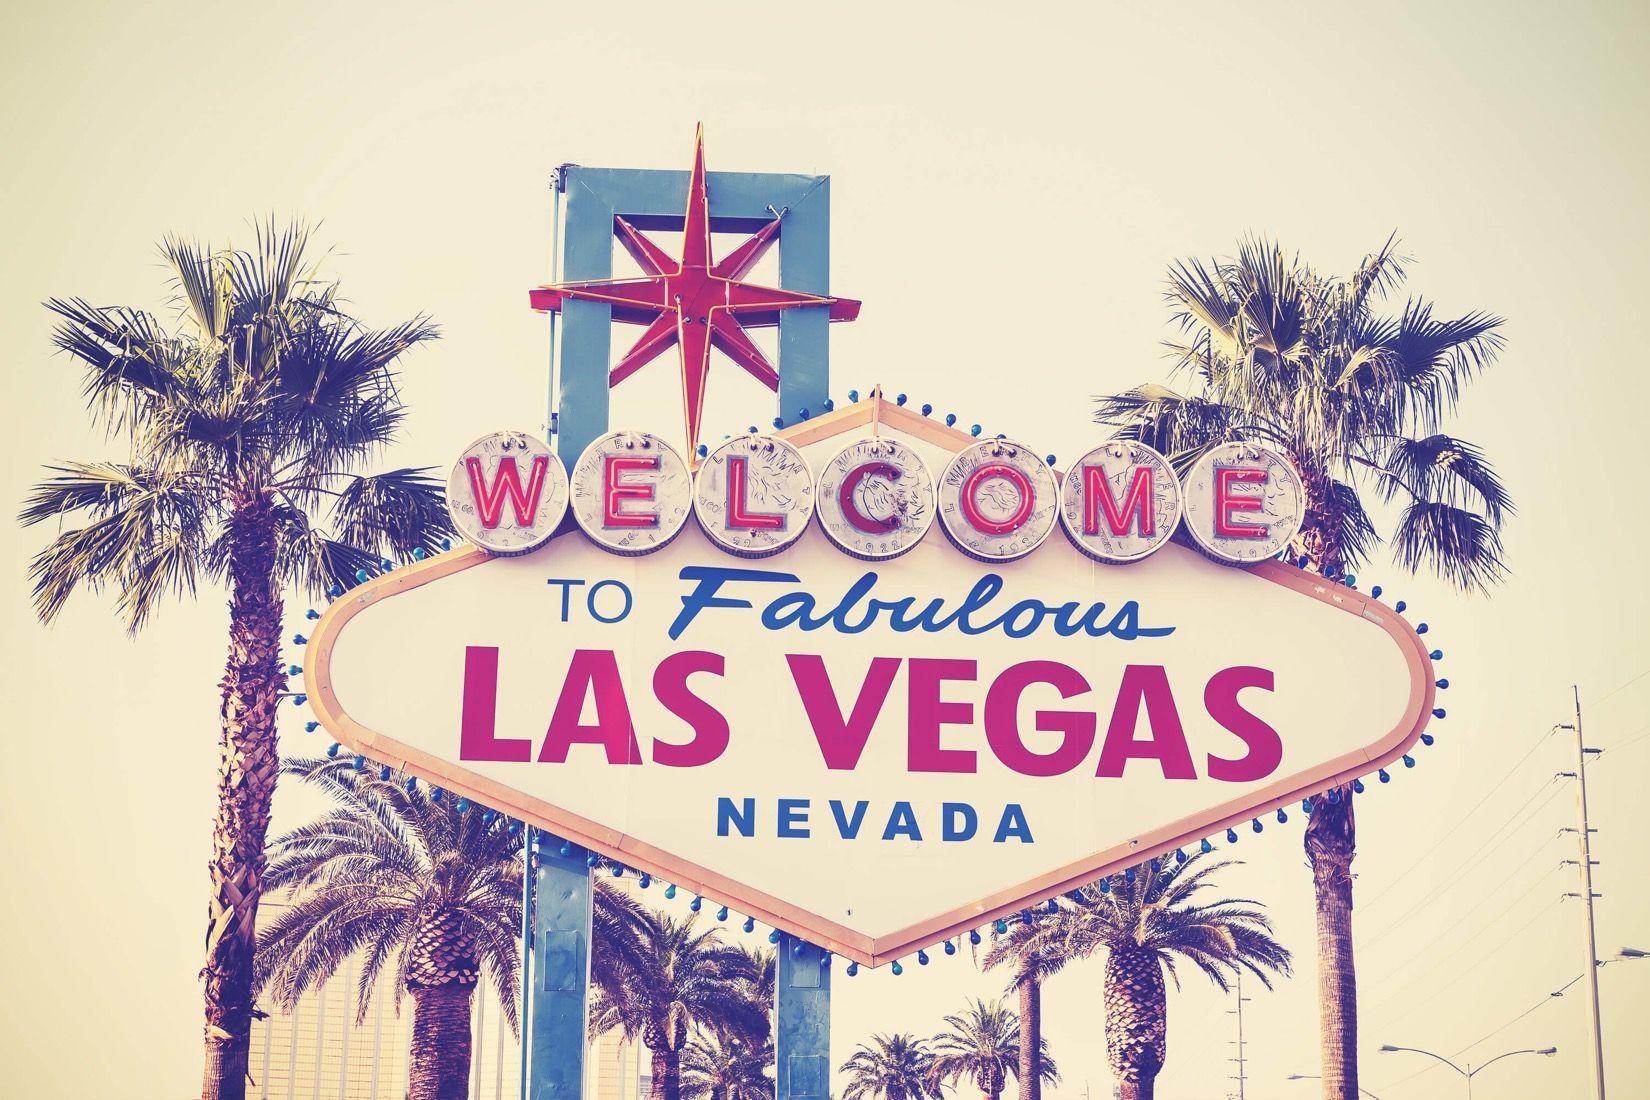 Las Vegas Sign Wallpaper Mural Hovia Las Vegas Painting Las Vegas Sign Vegas Sign